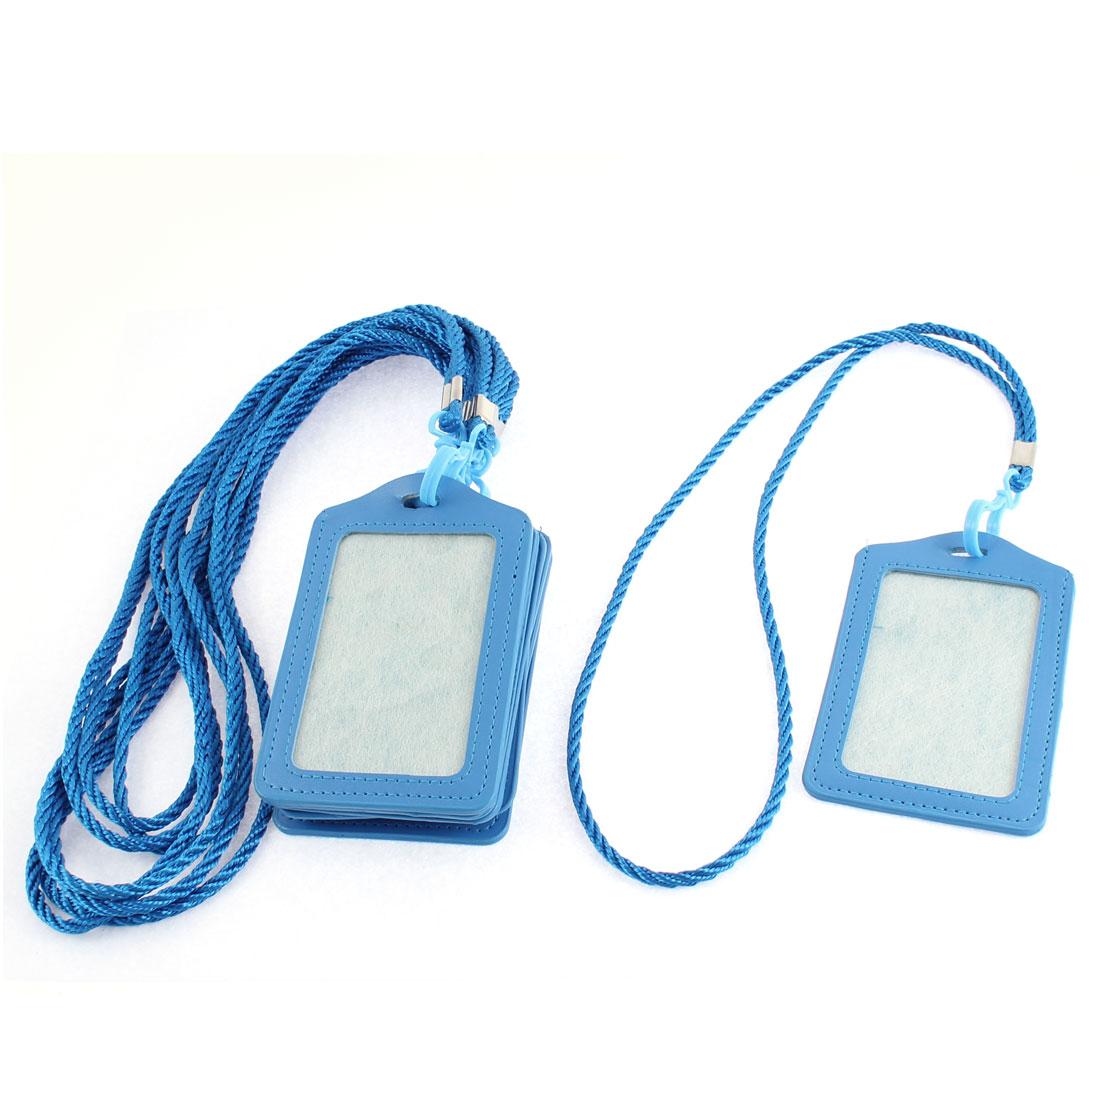 Faux Leather Vertical Design Office Business Badge Credit Card Holder Blue 8pcs